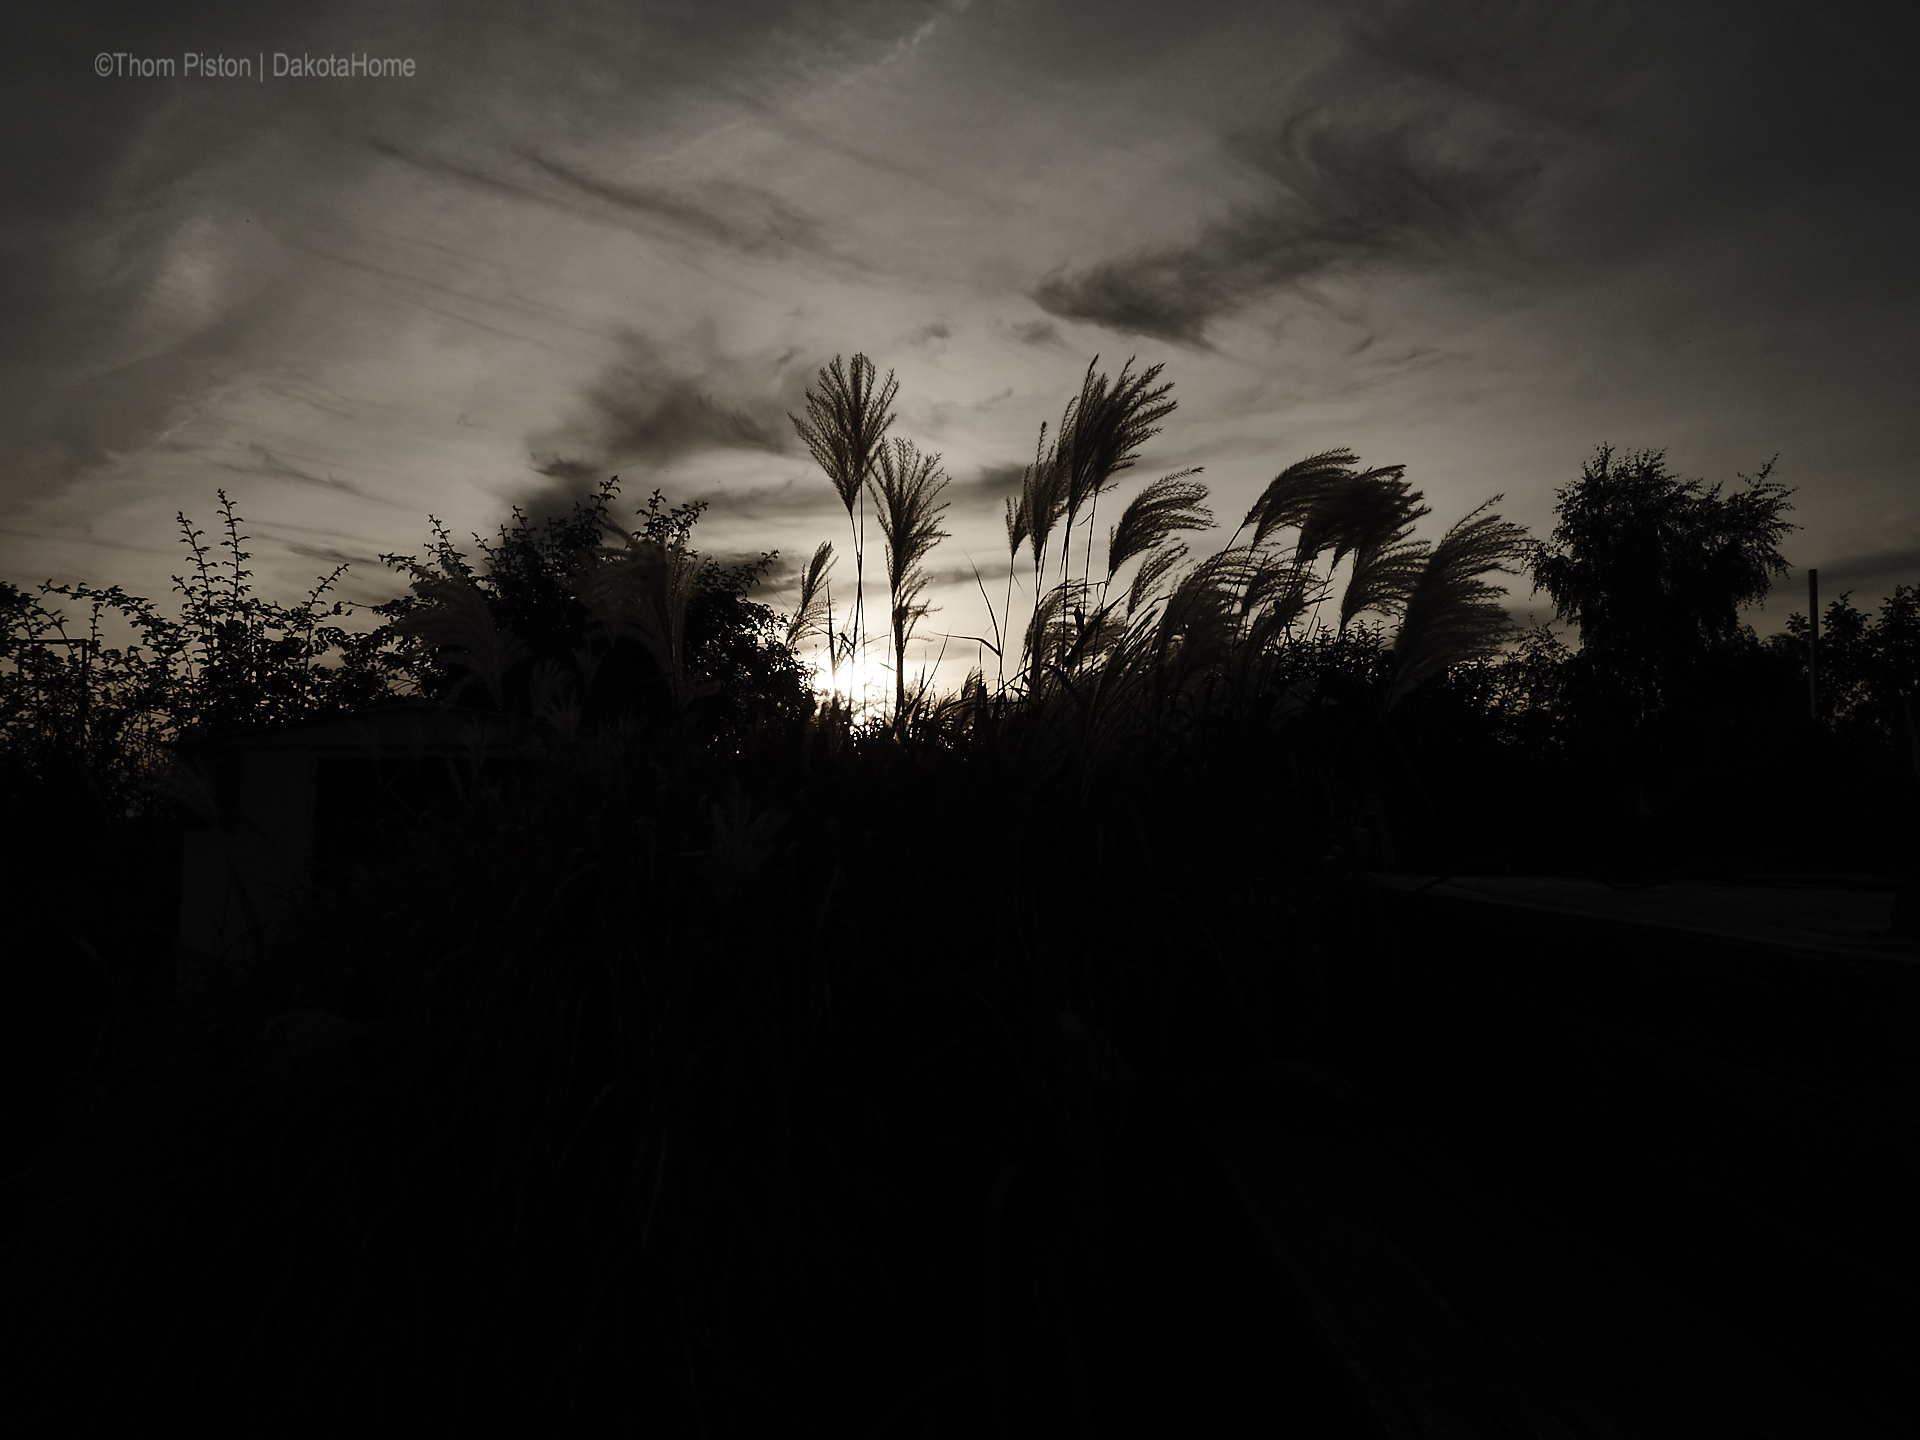 Schilf mit Sonnenuntergang, mitte September, Dakota Home